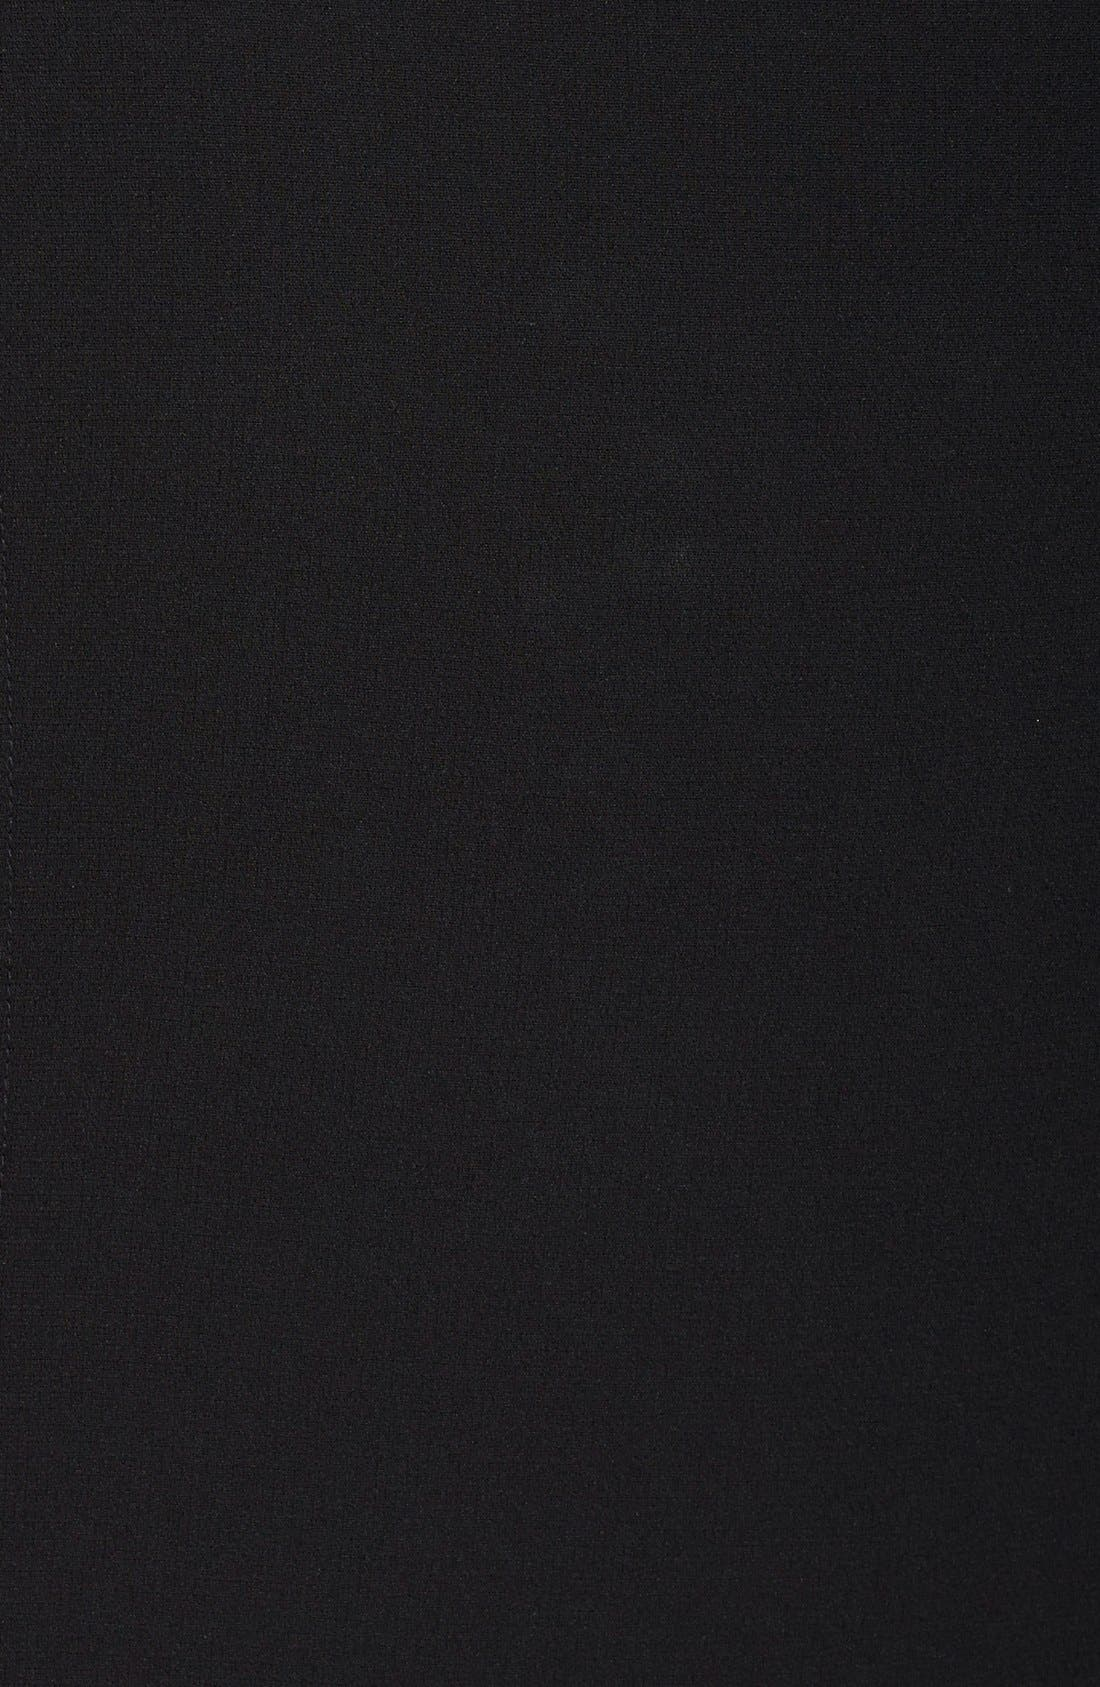 Sleeveless Suiting Sheath Dress,                             Alternate thumbnail 5, color,                             Black